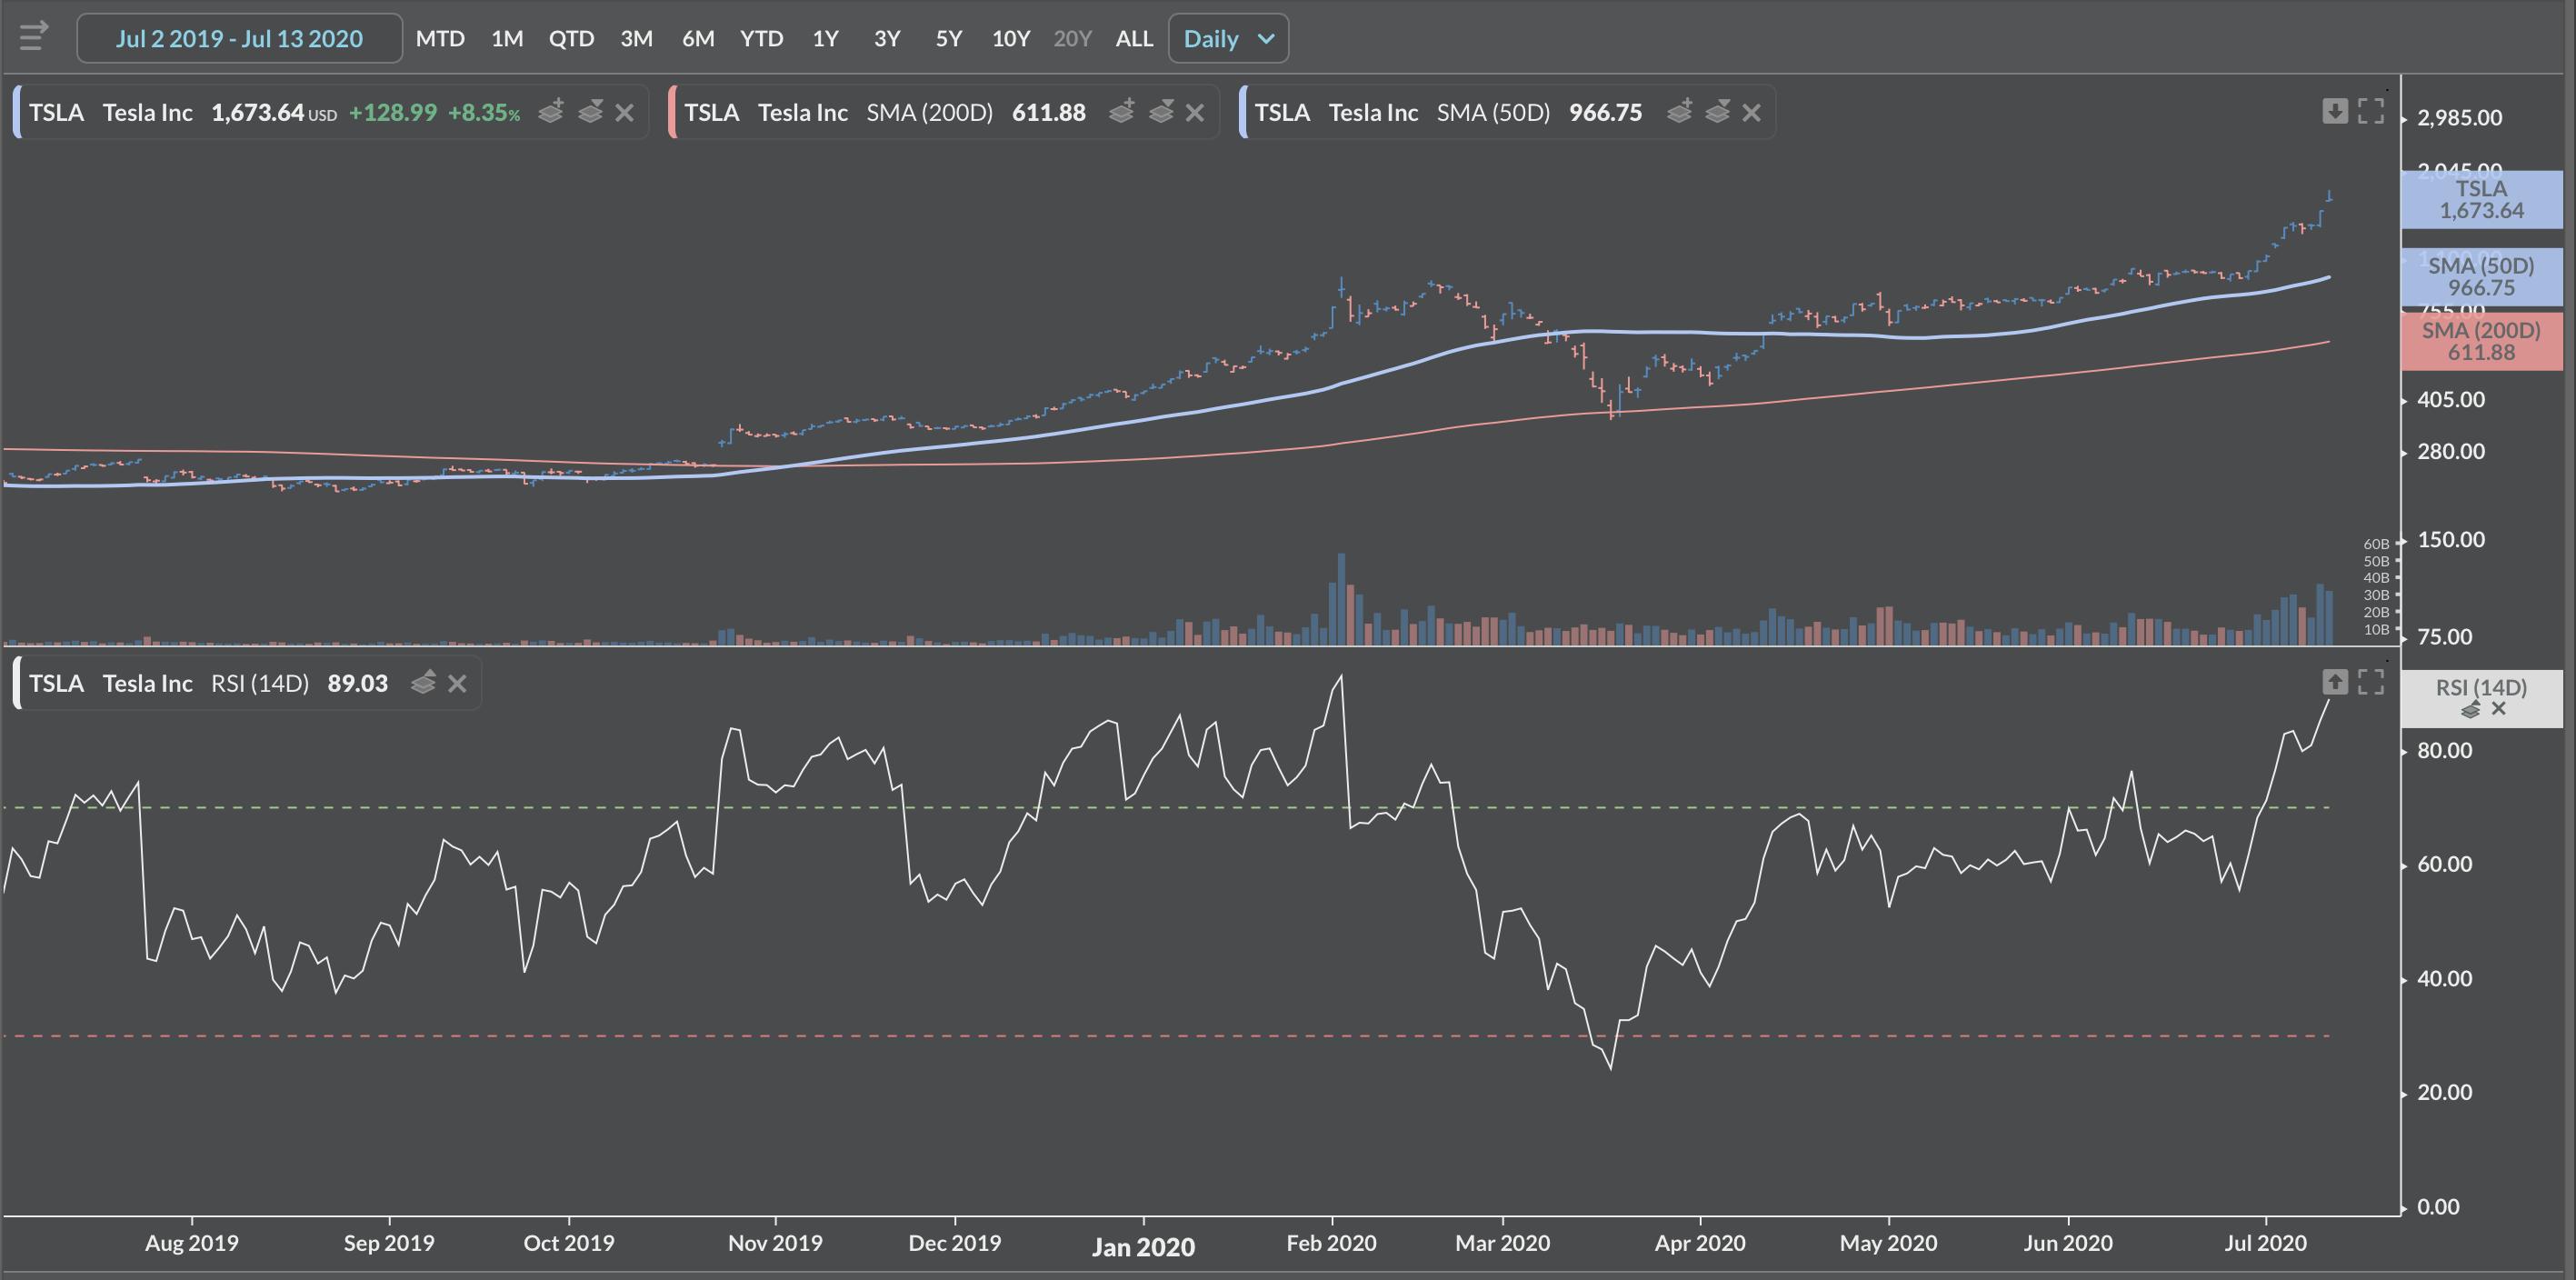 Tesla RSI Index share price movements